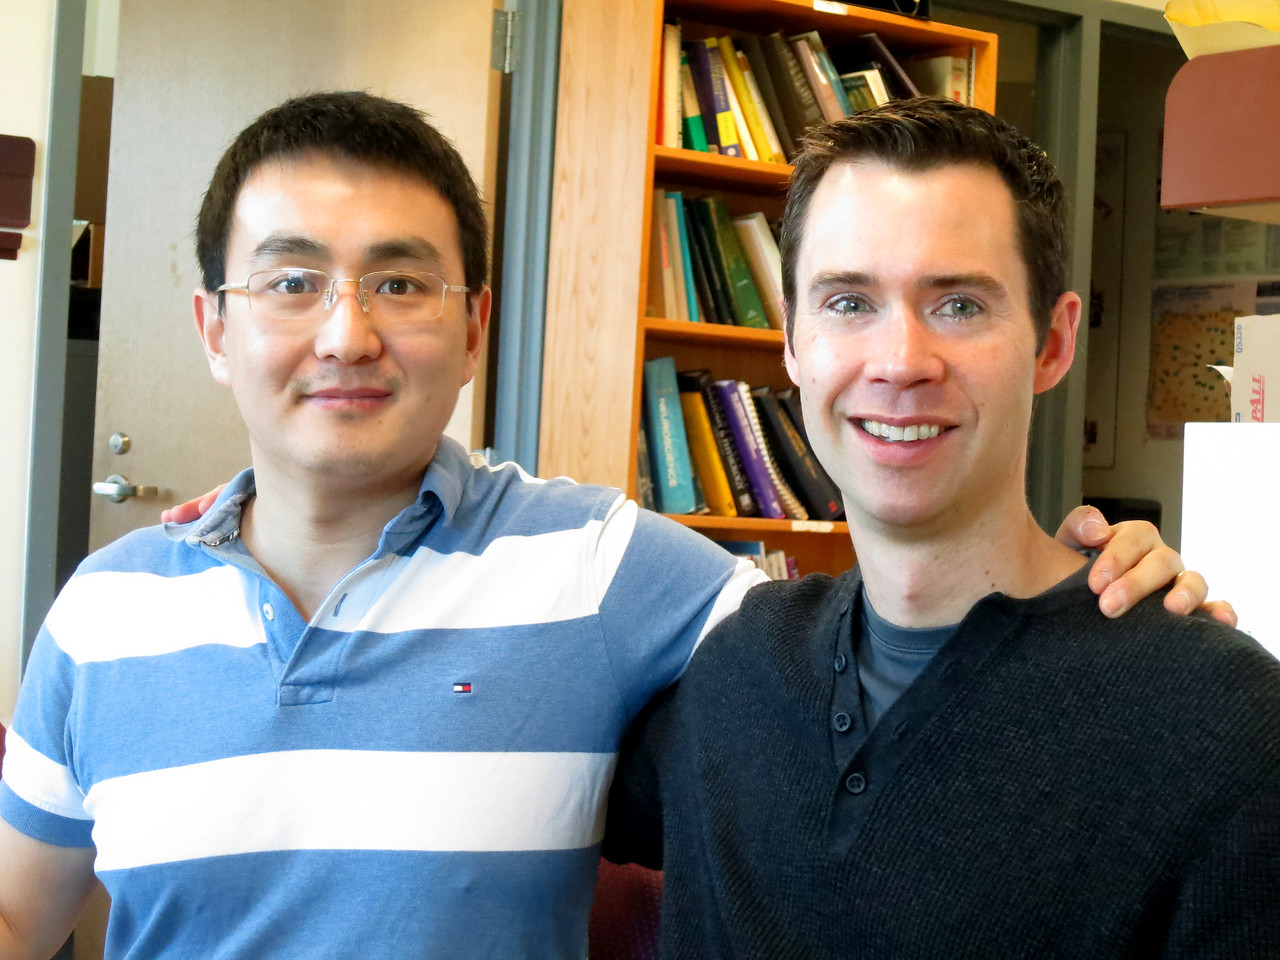 Kang Liu & Mike Hagan